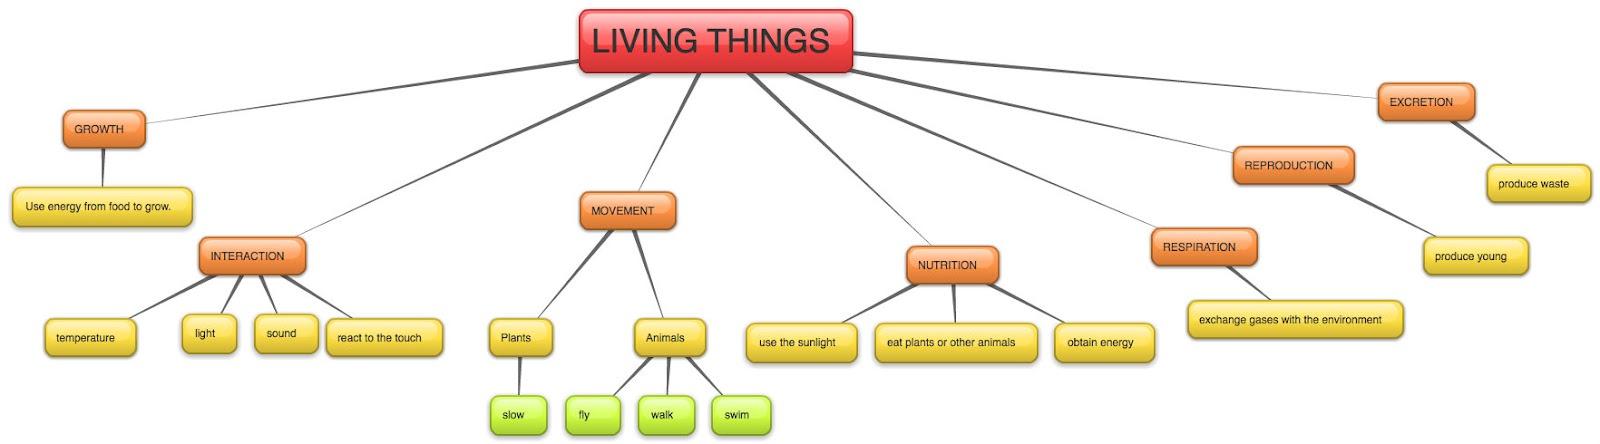 external image LIVING+THINGS+CHARACTERISTICS.jpg